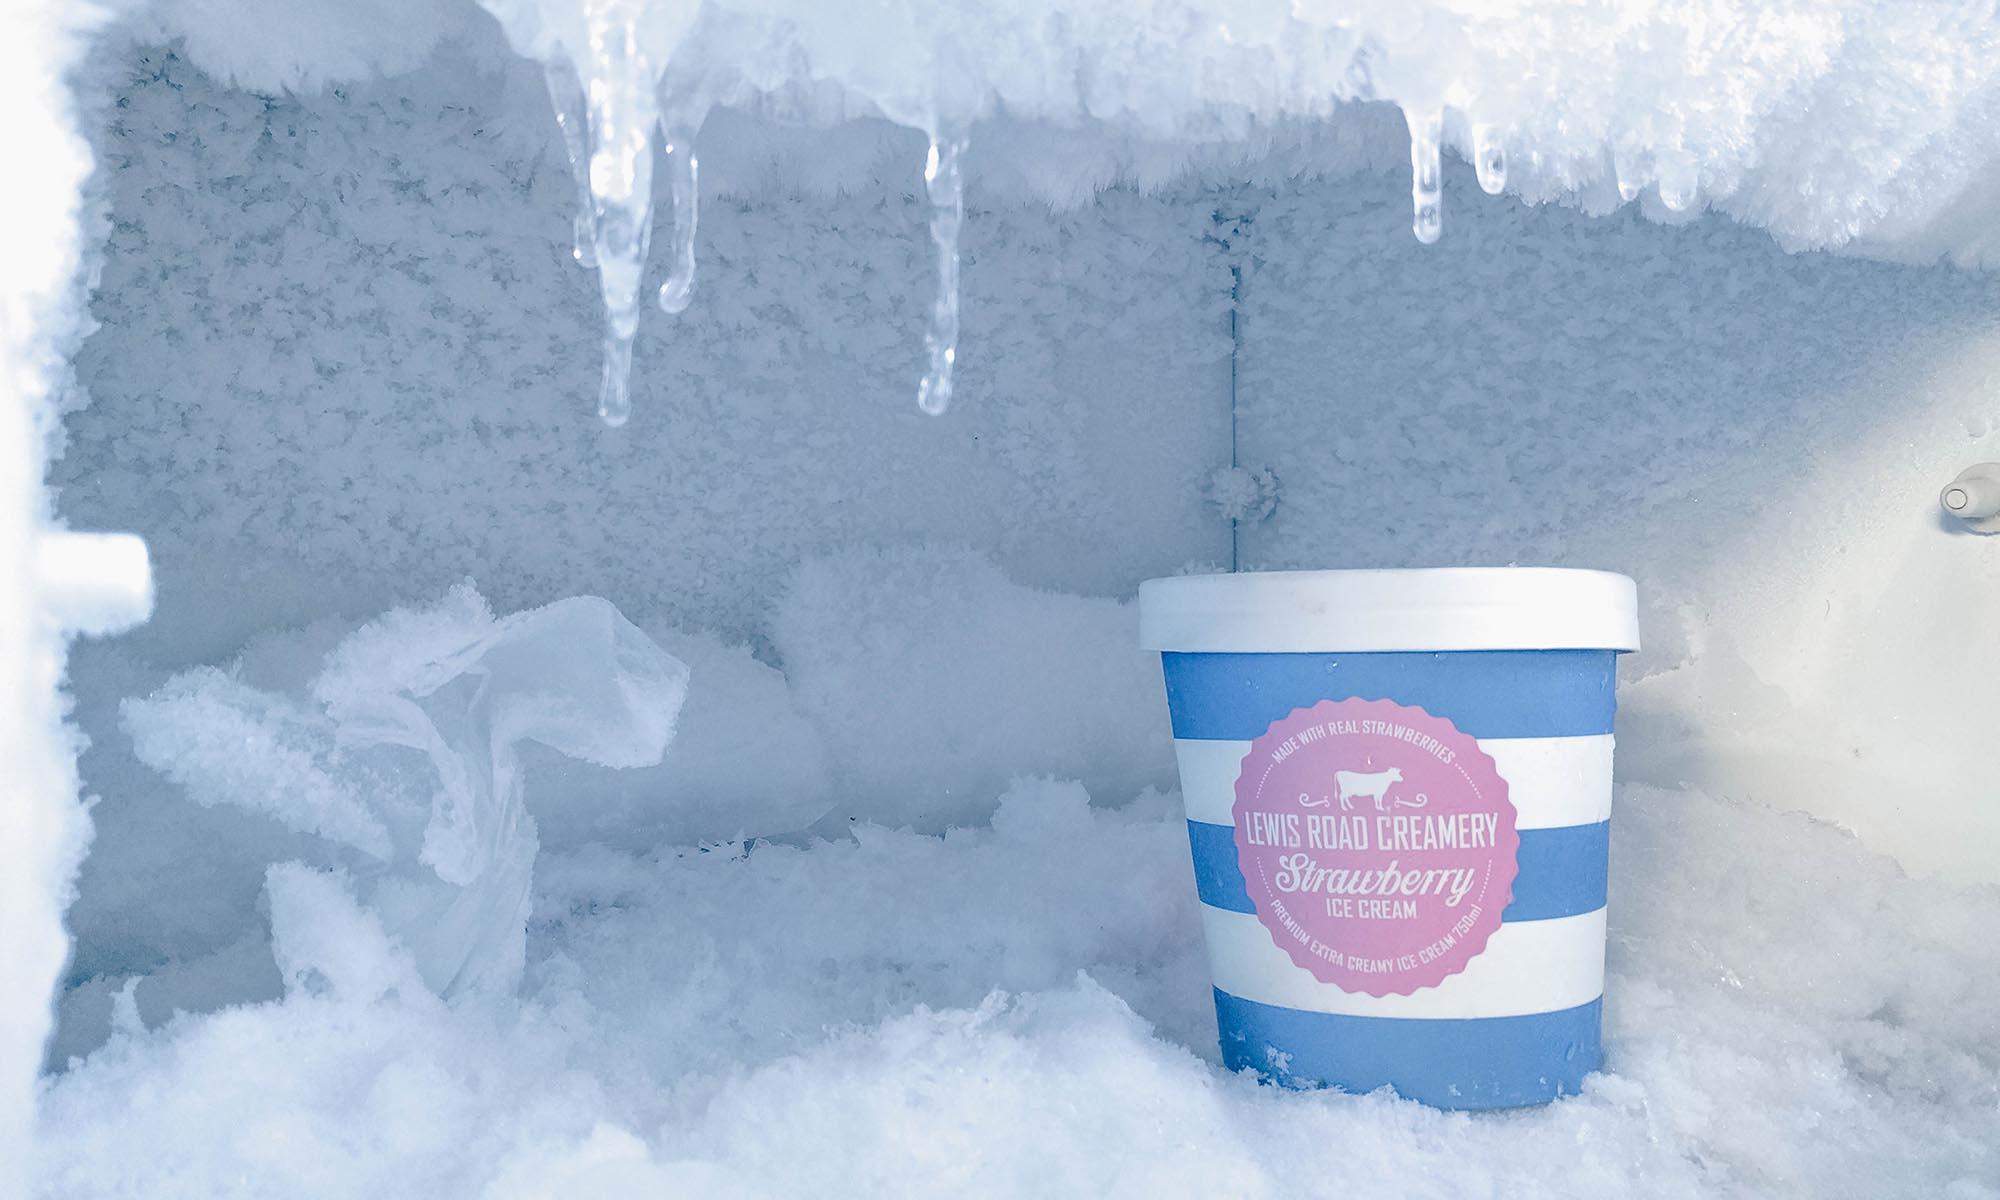 Kühlschrank Eiswürfel : Eiswürfel archive k o c h d u n s t